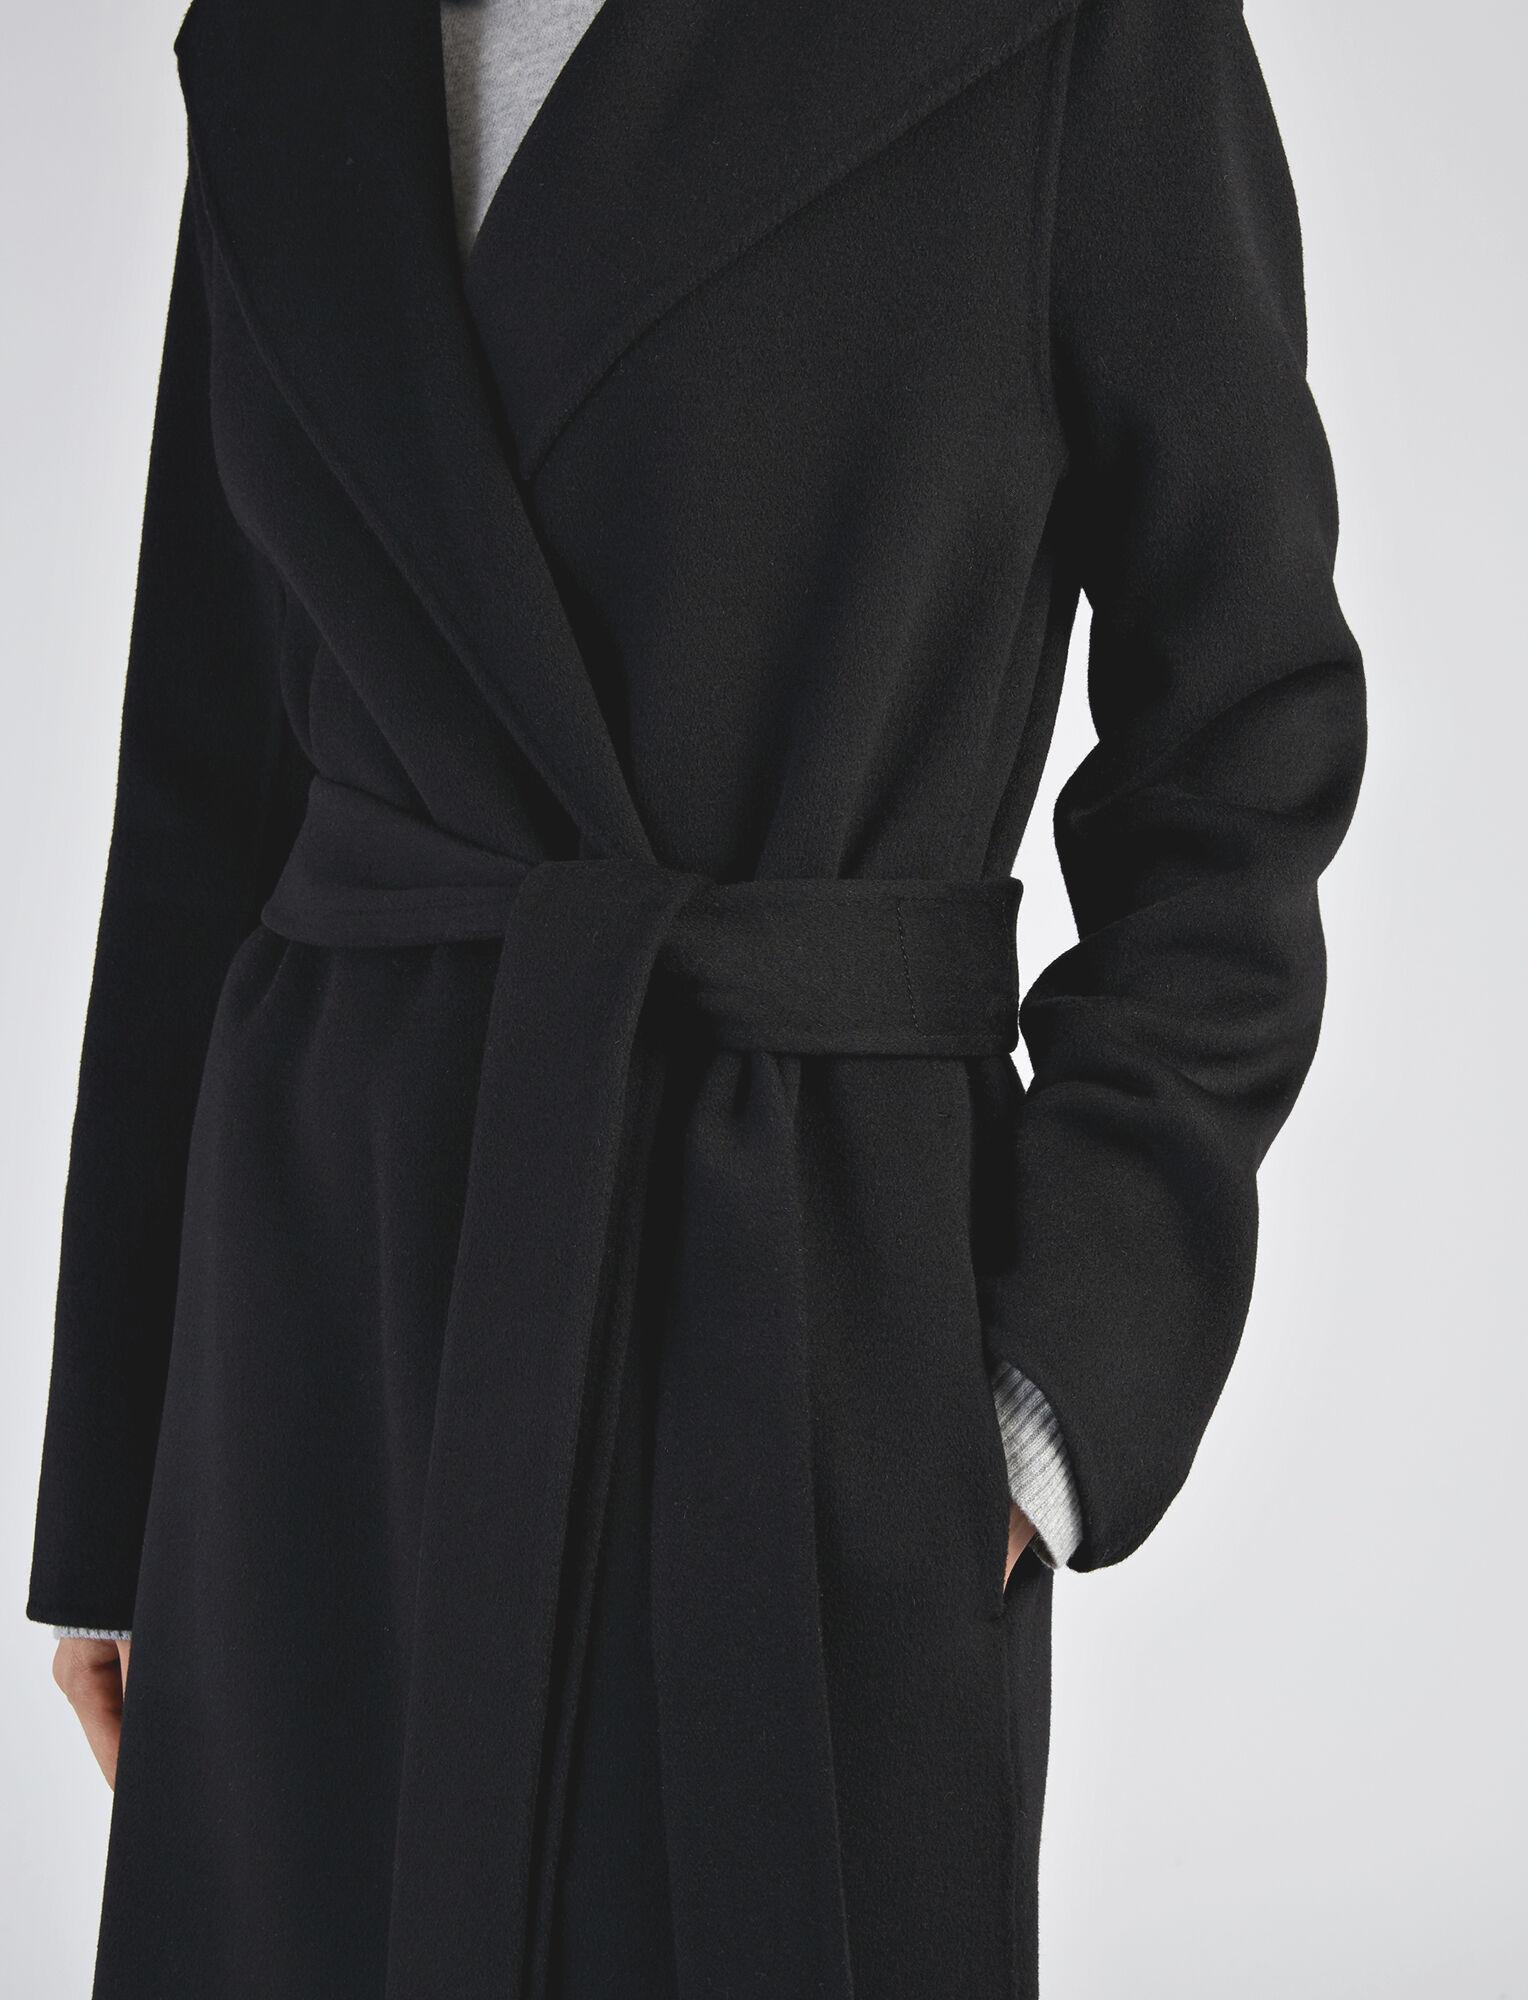 Joseph, Double Face Cashmere Lima Coat, in BLACK